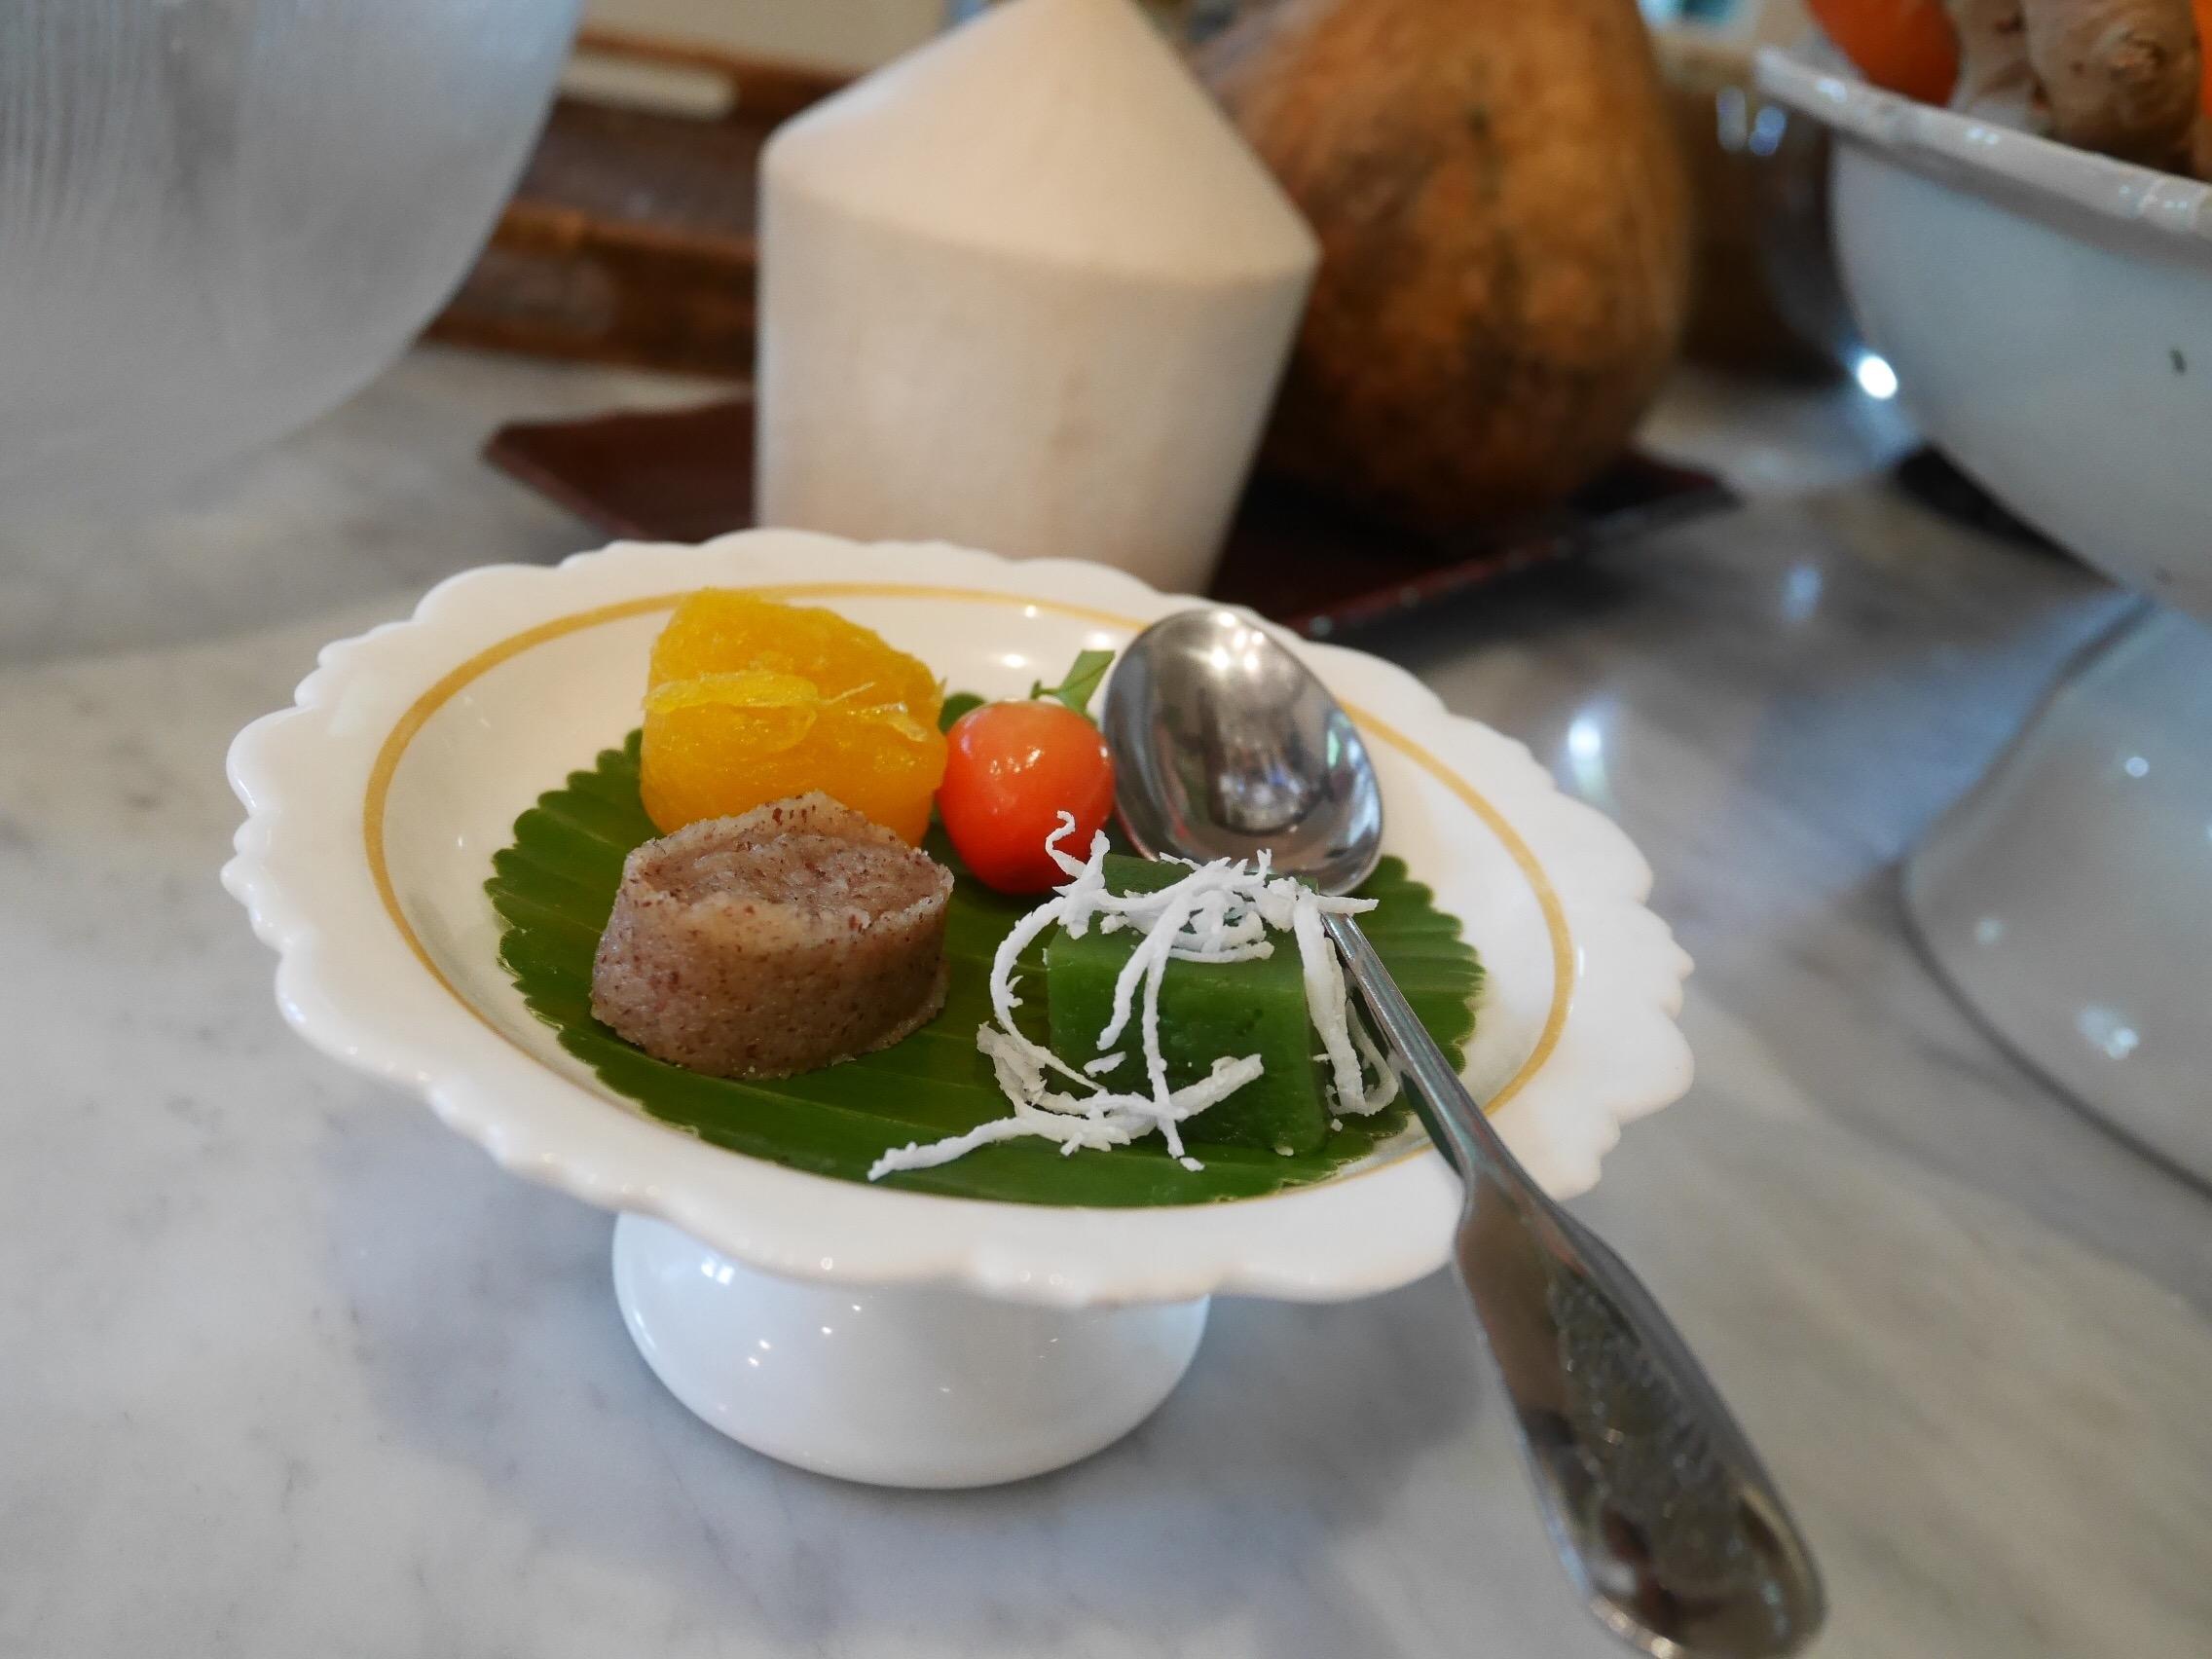 img 9093 - The Oriental Thai Cooking School - マンダリンオリエンタルバンコクのおもてなし空間で体験する絶品タイ料理教室